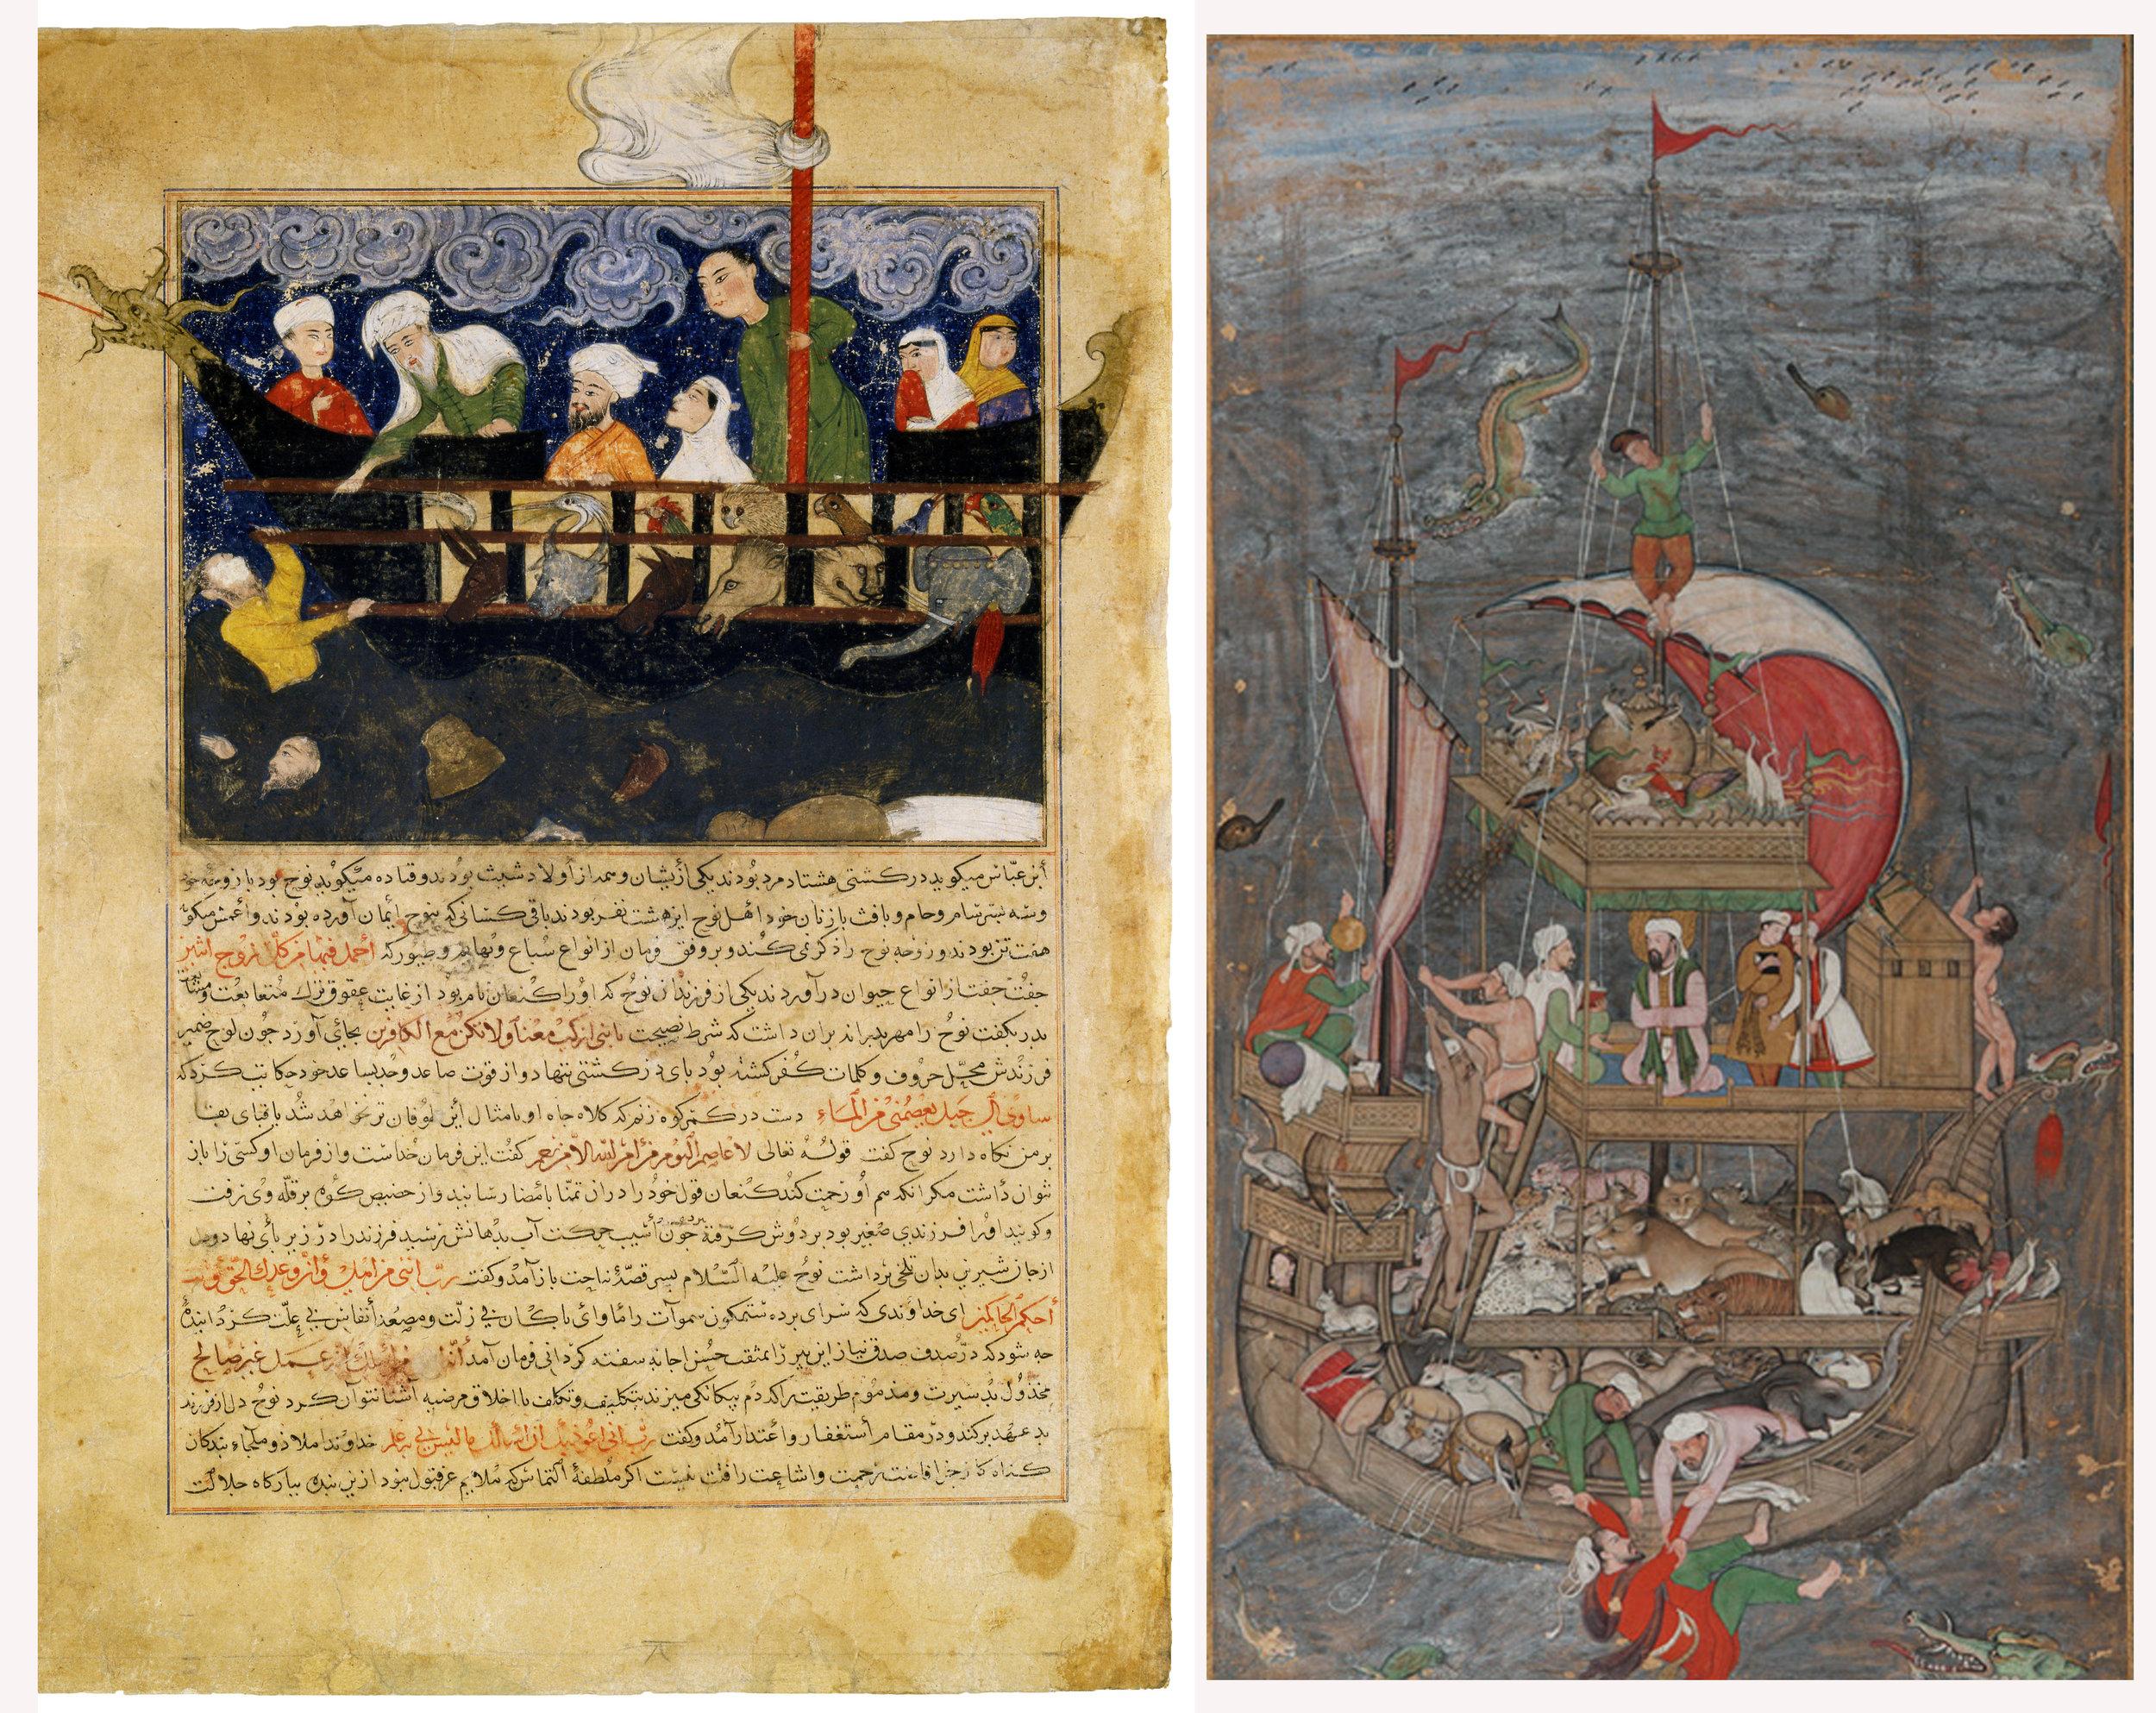 16_2-8-2005-Noahs-ark-Hafis-Abru-2.jpg